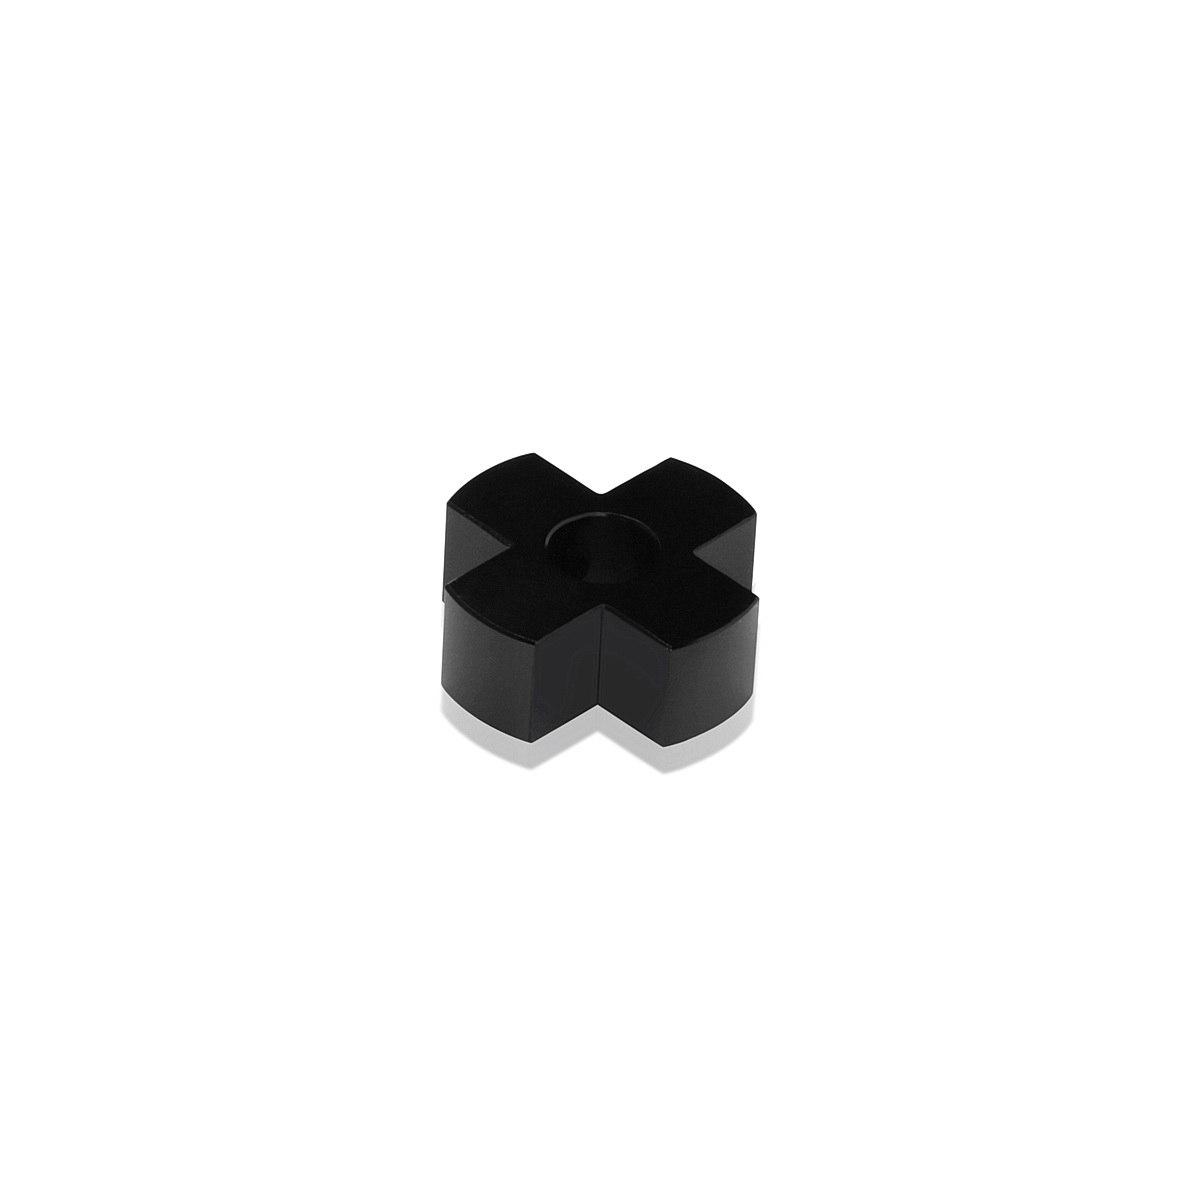 4-Way Standoffs Hub, Diameter: 1'', Thickness: 3/8'', Black Anodized Aluminum